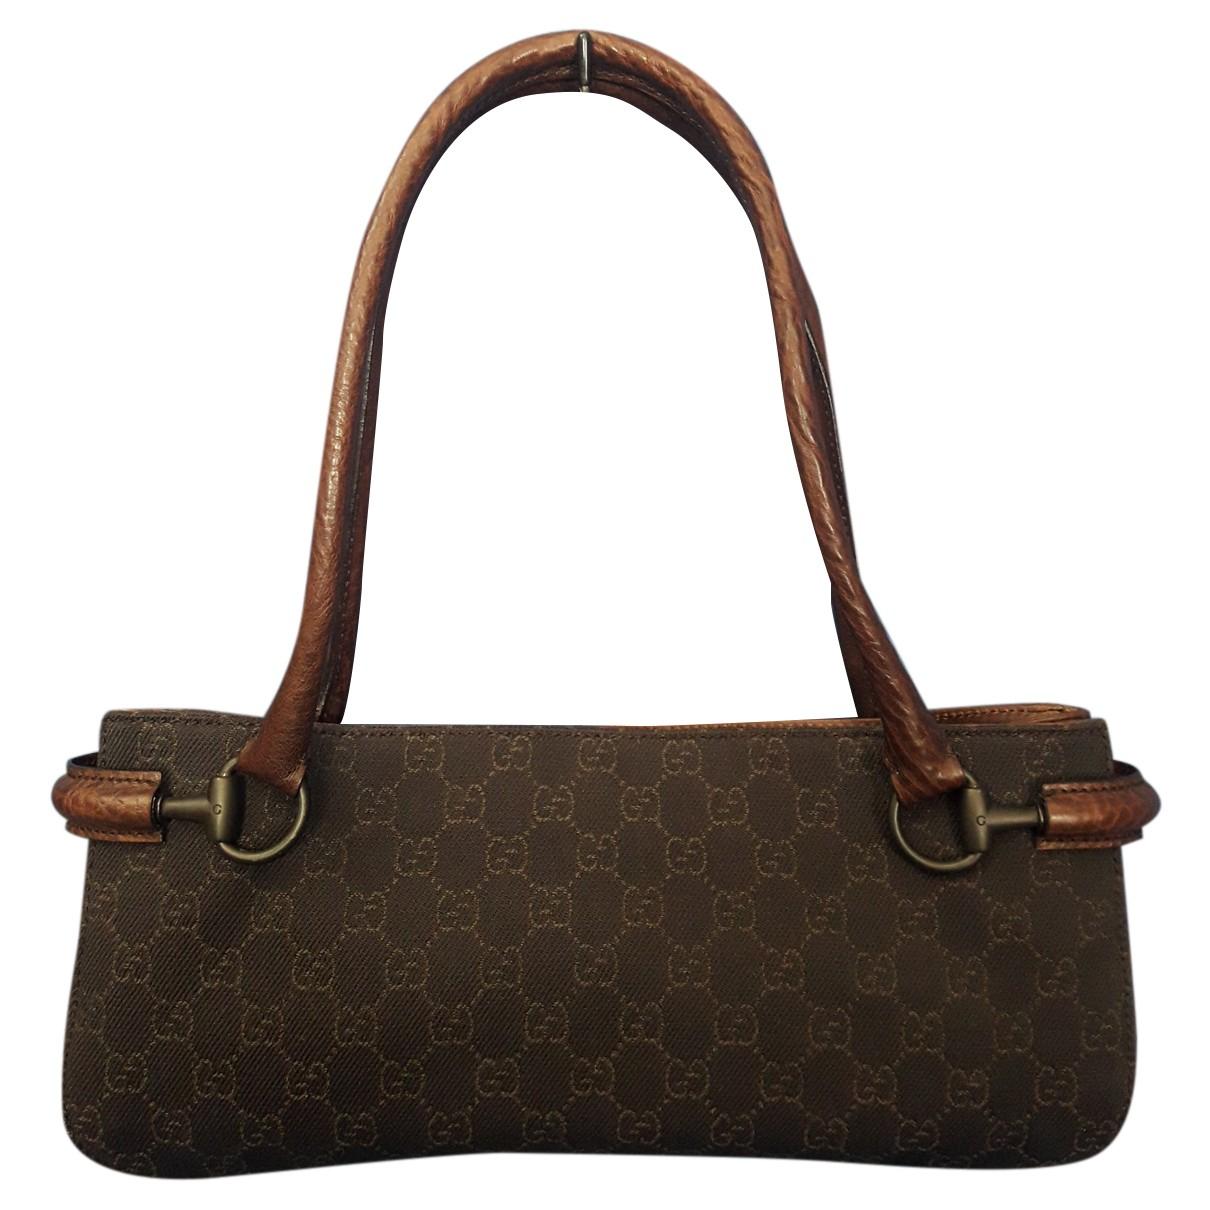 Gucci N Brown Cloth handbag for Women N